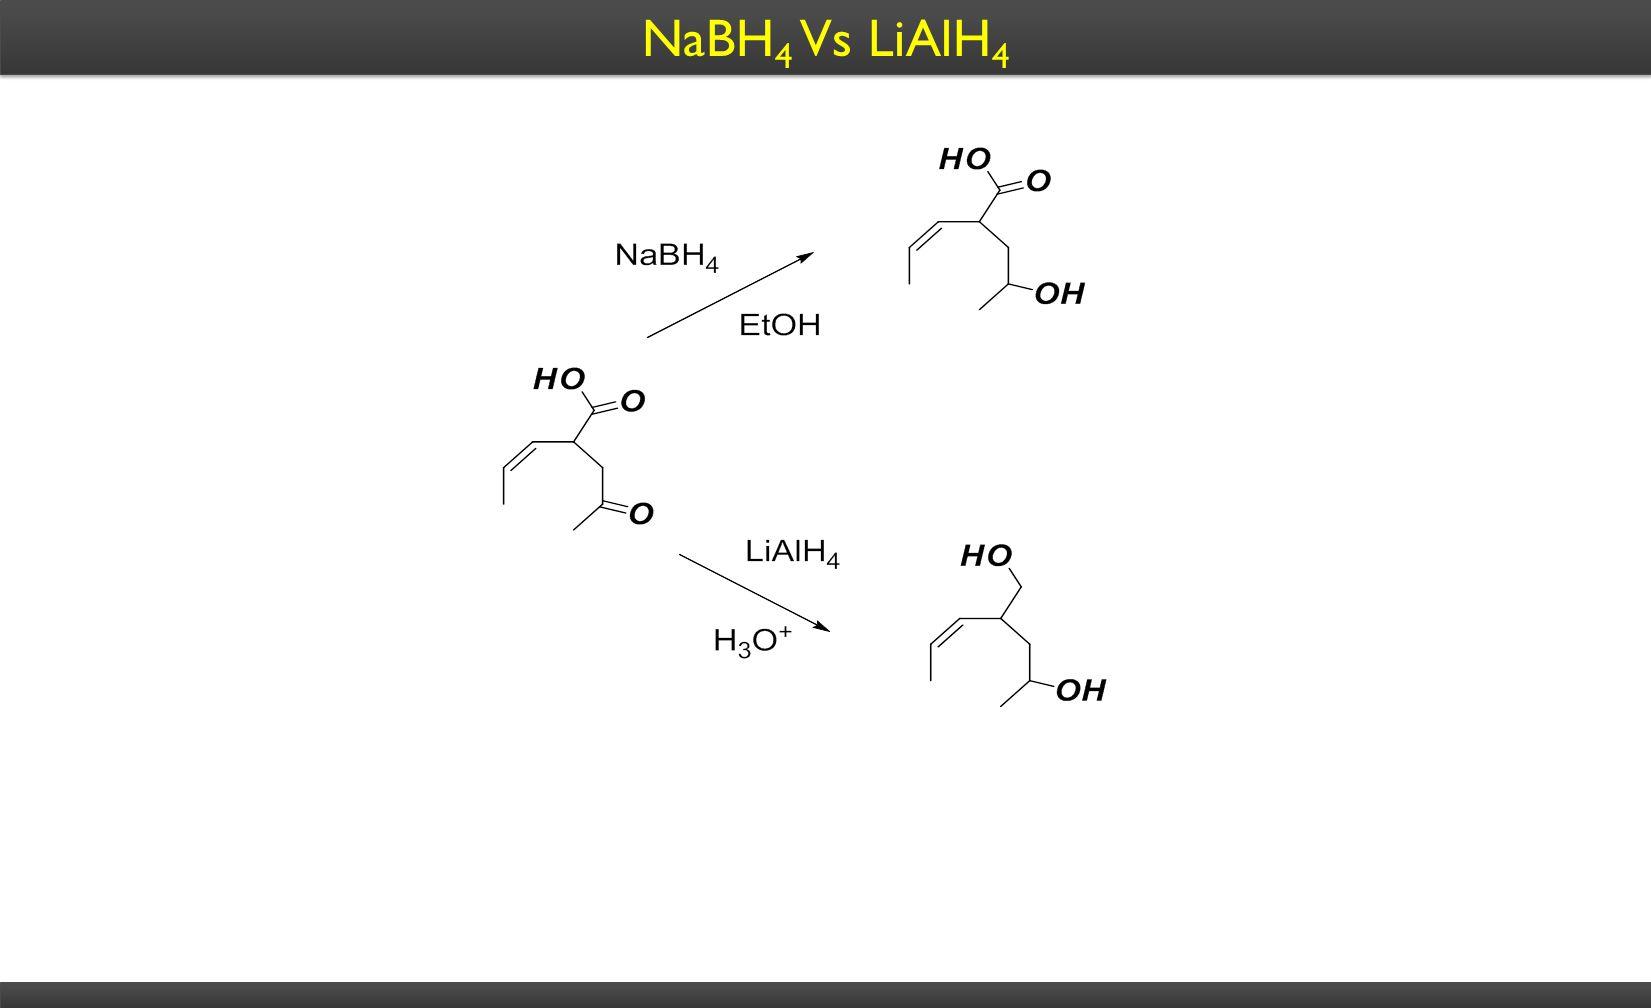 NaBH 4 Vs LiAlH 4